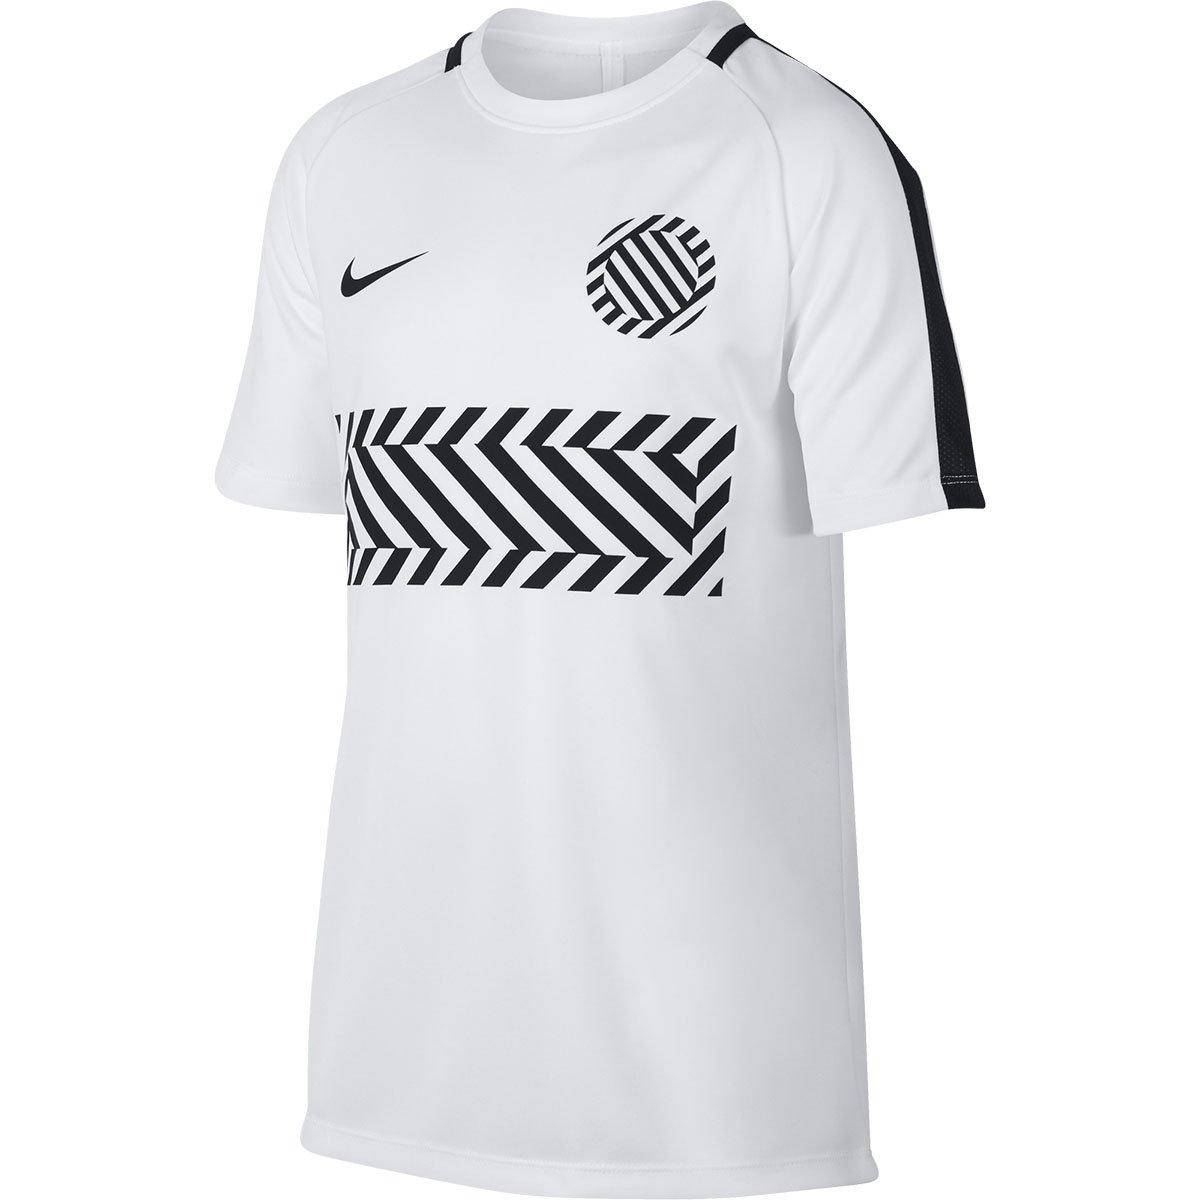 new styles 49f8c 46ffc Nike Mens Dry Academy Football T-Shirt (White/Black)